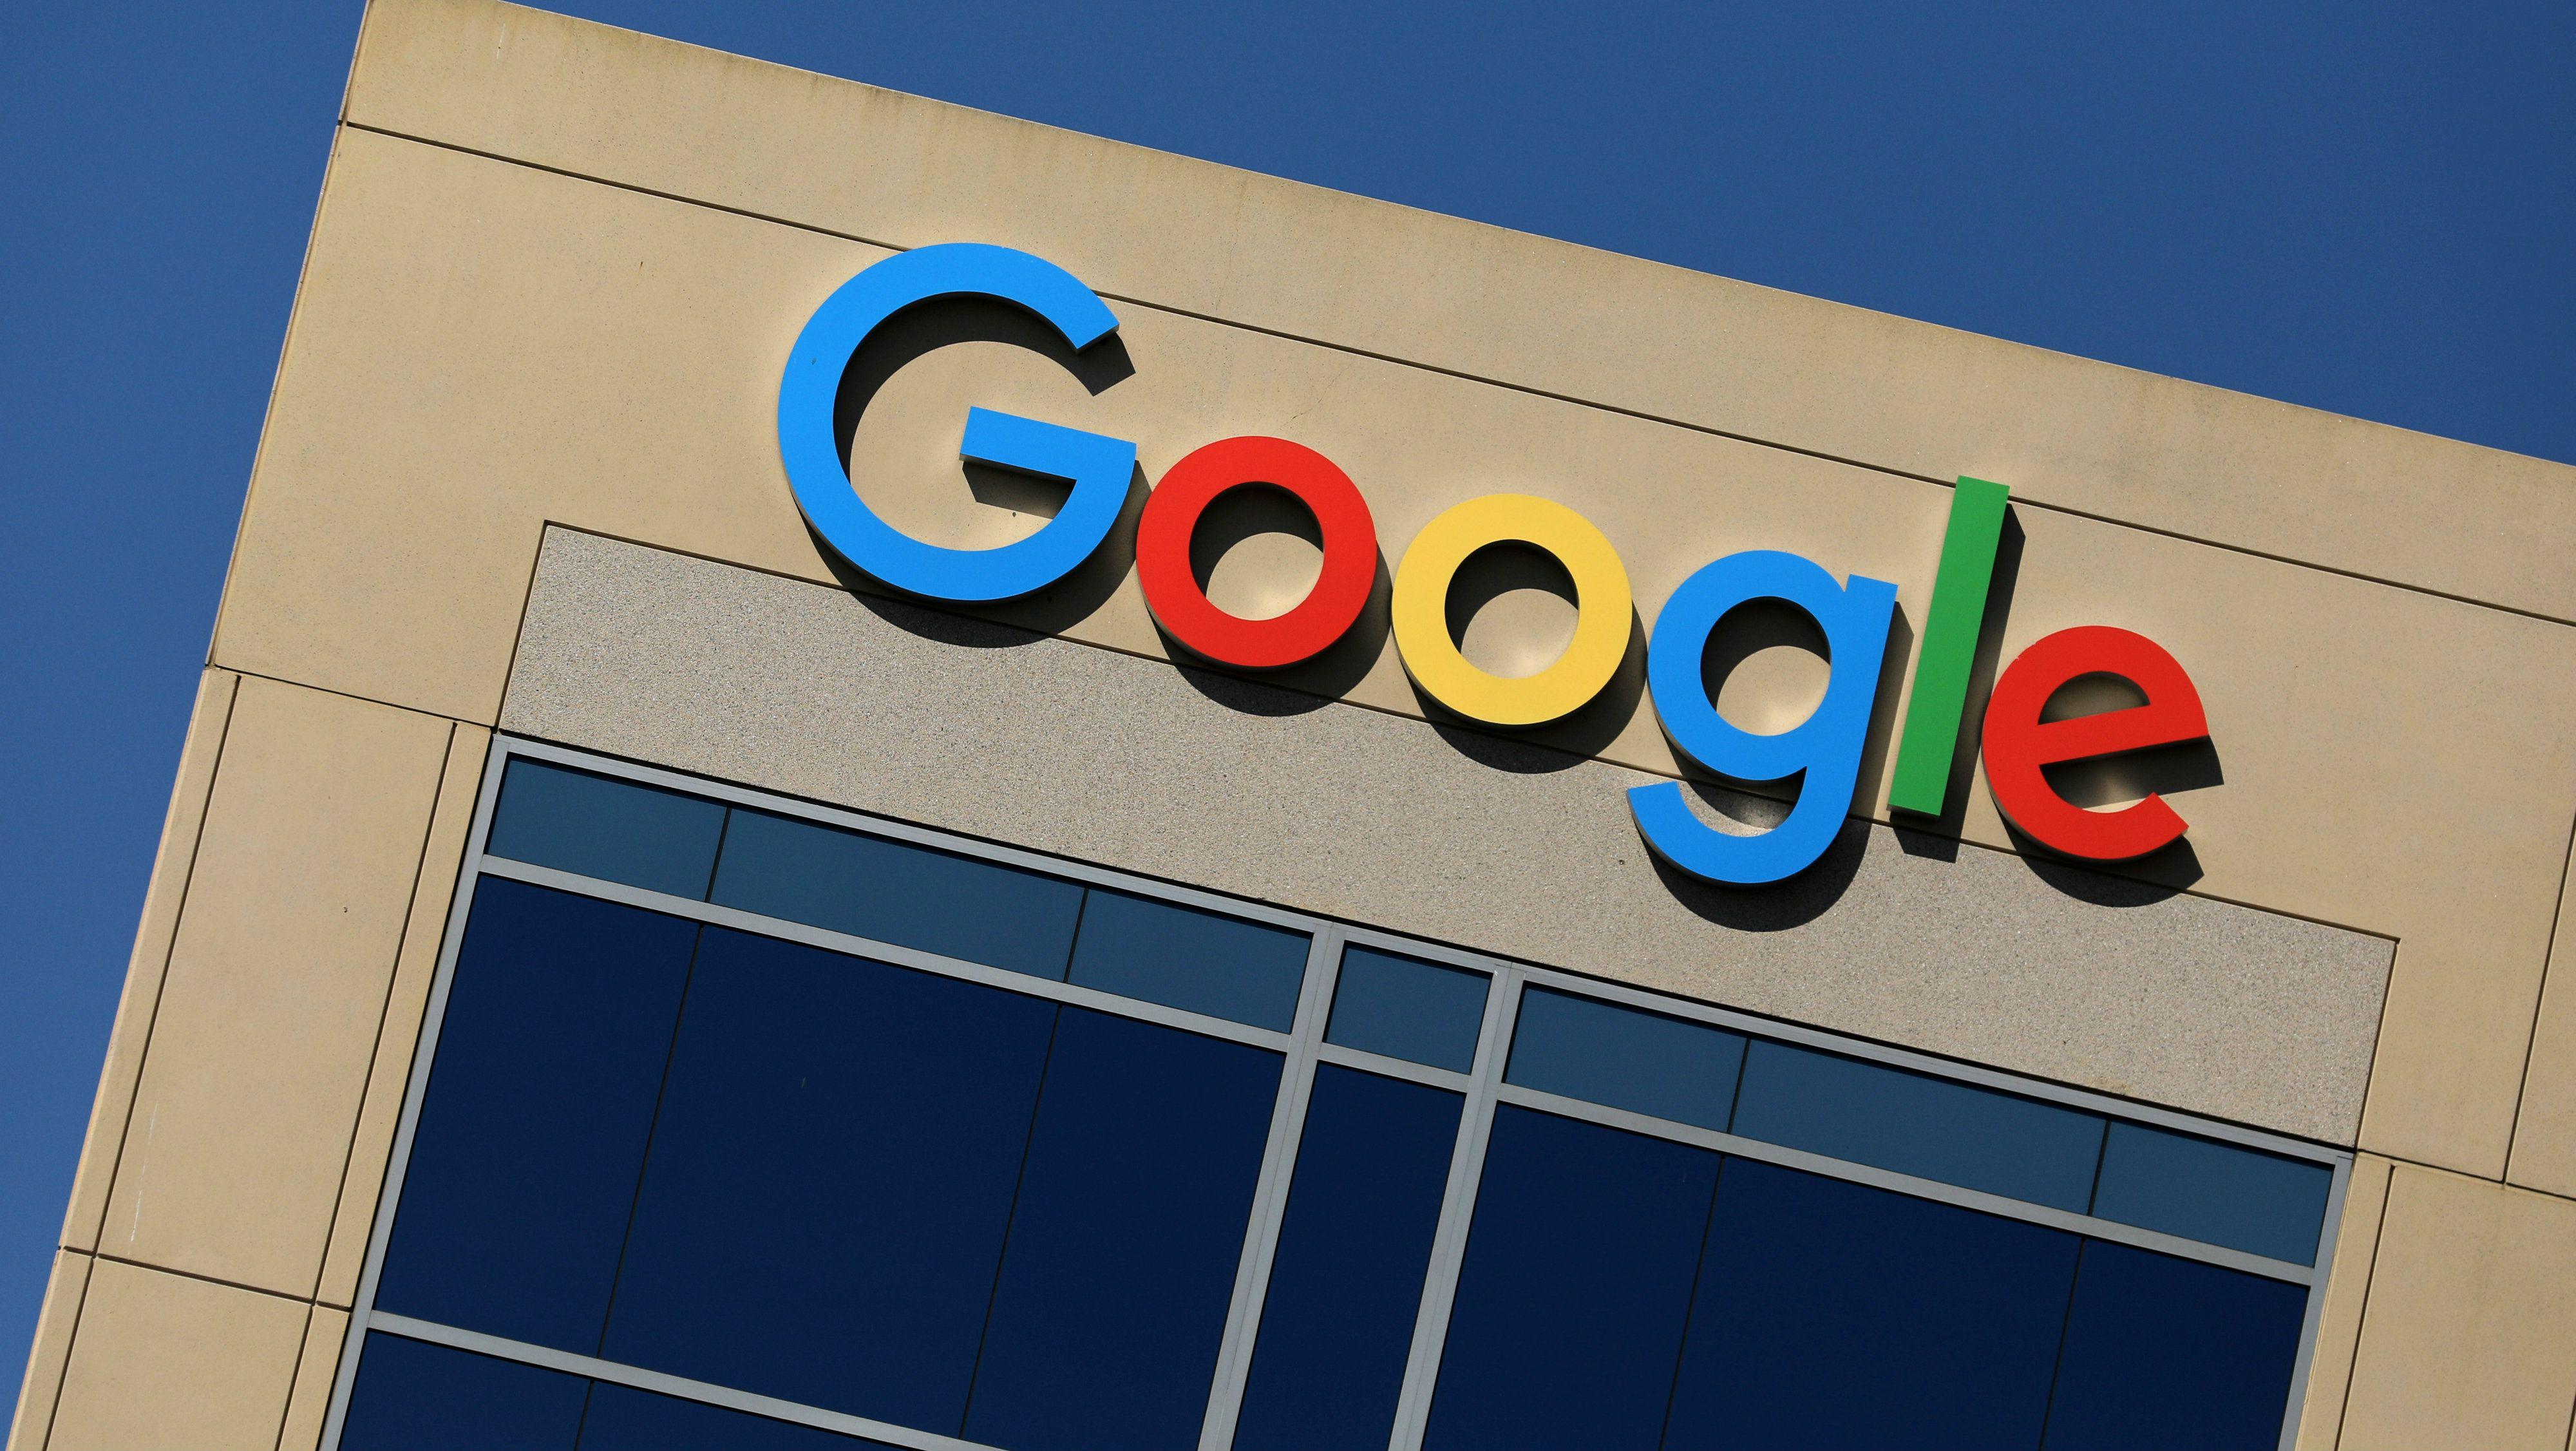 Власти Нью-Мексико подали в суд на Google и Twitter